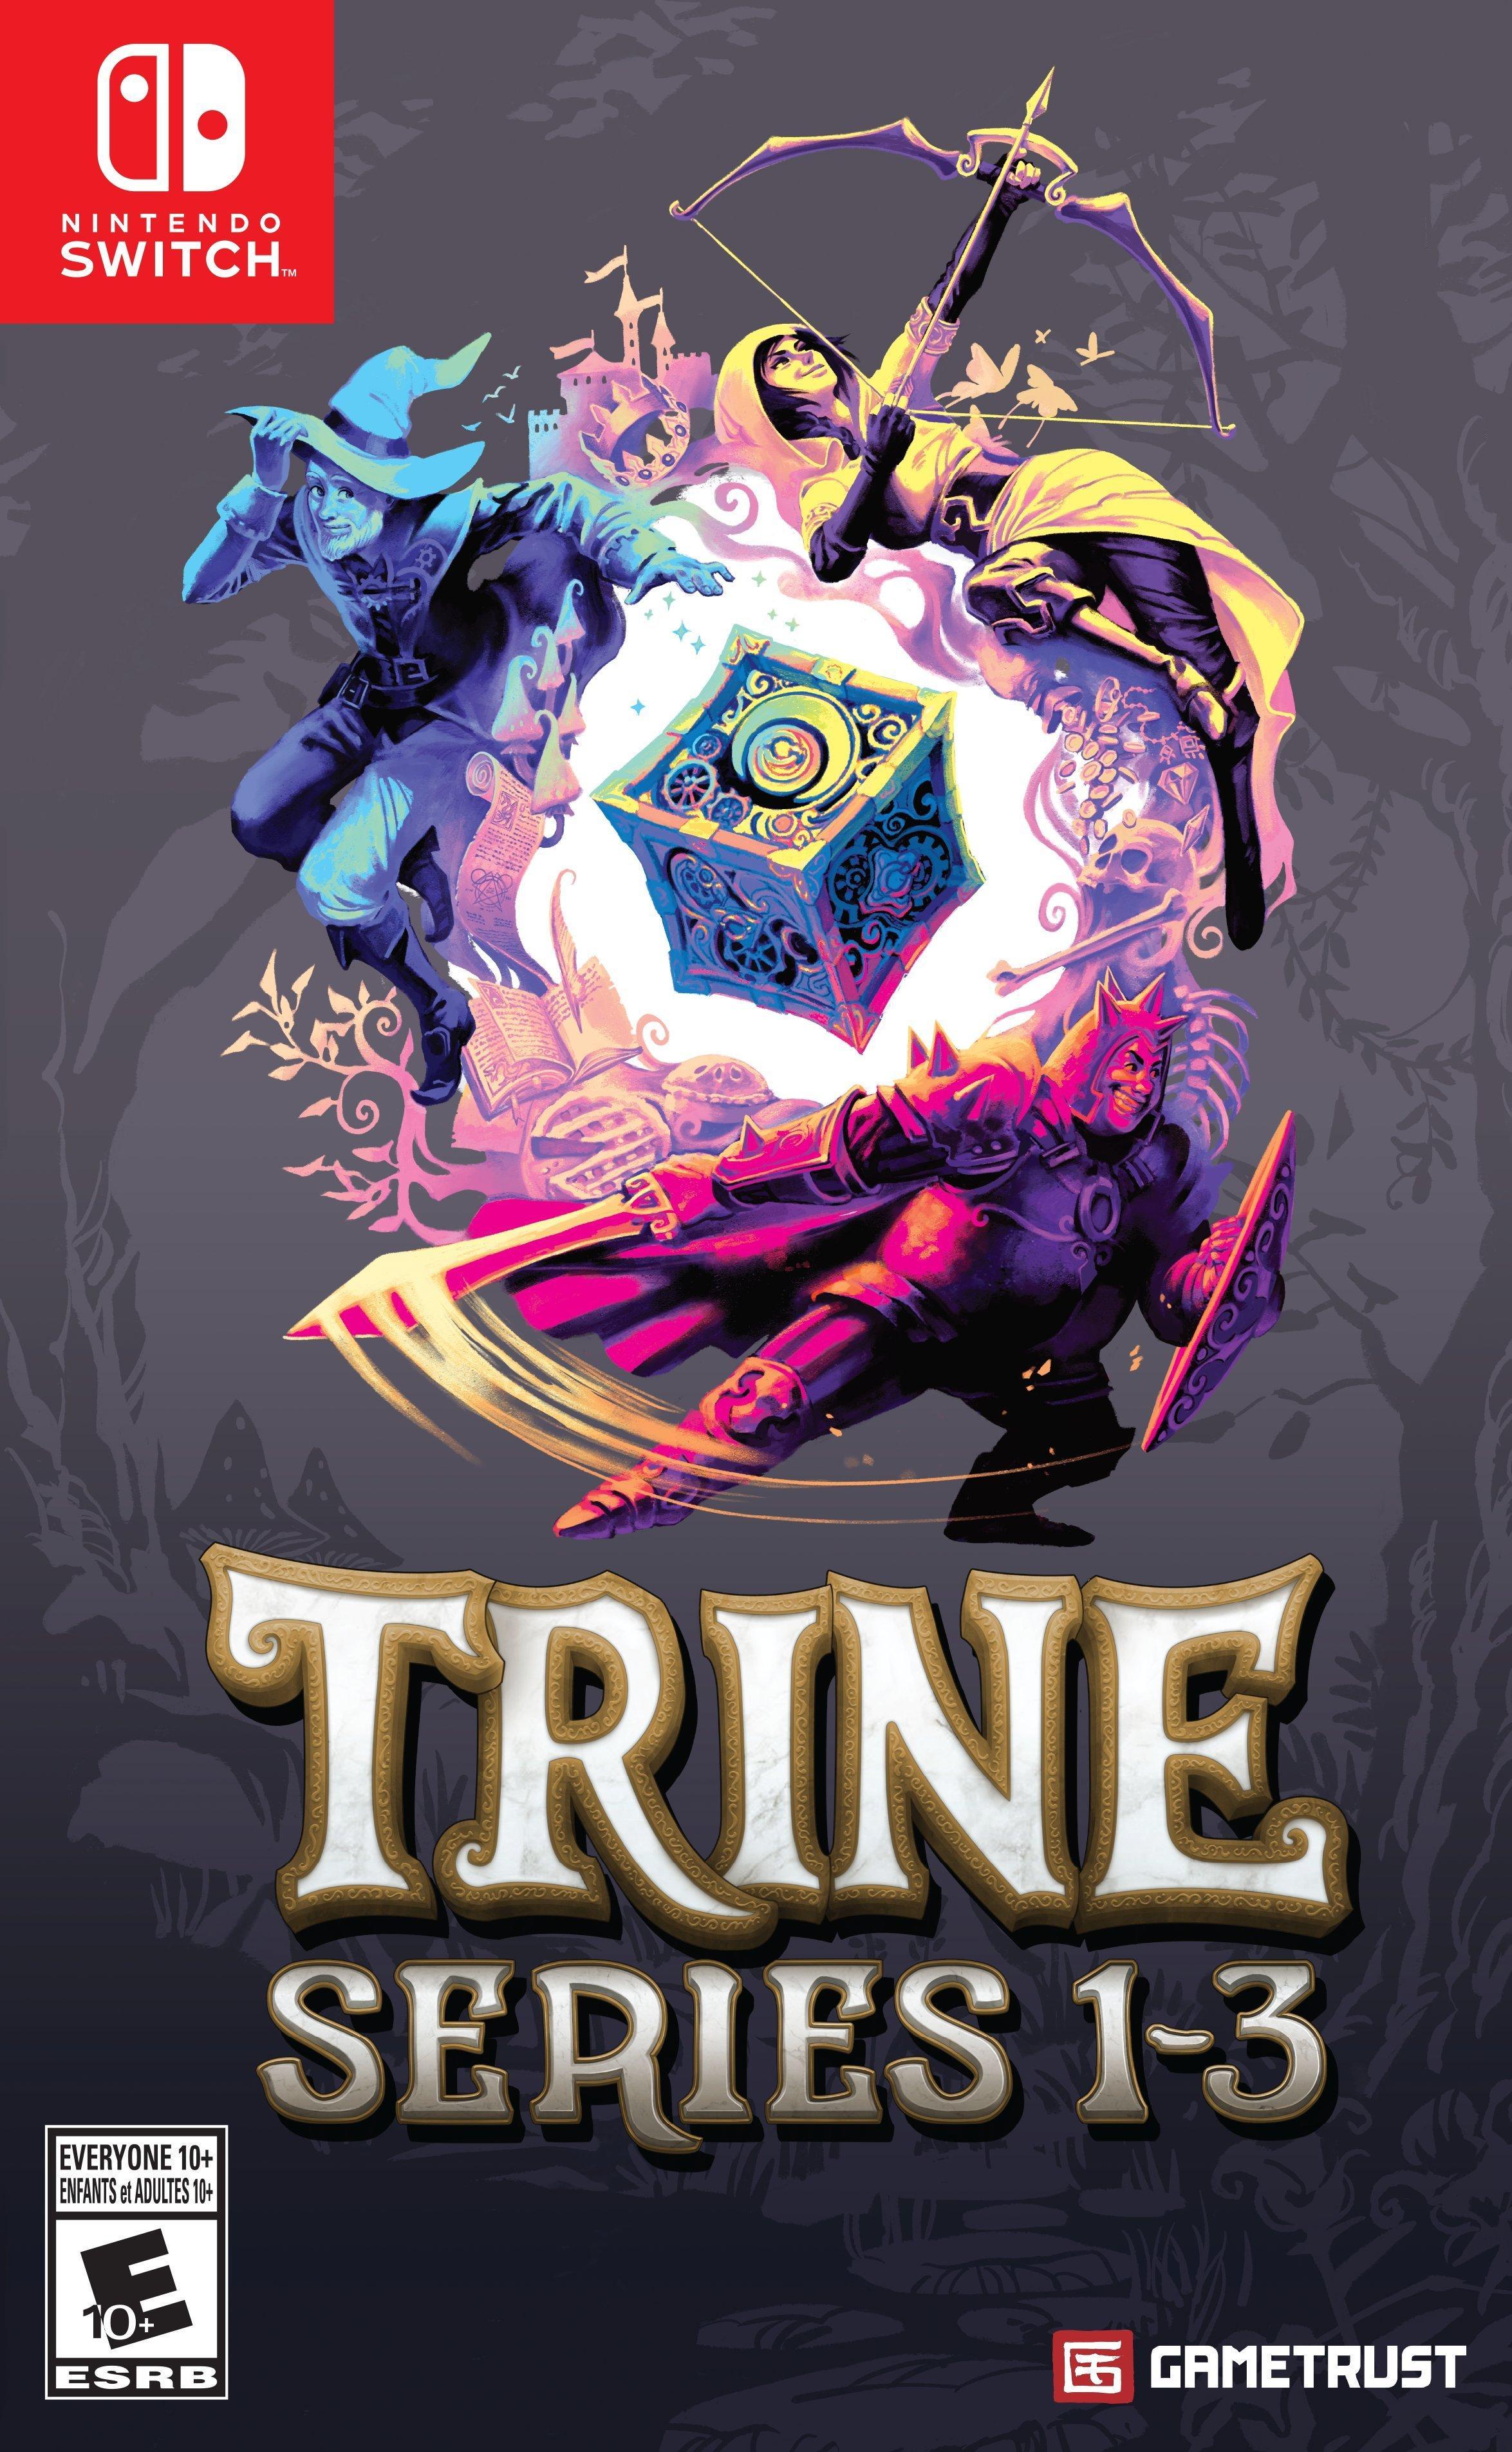 Trine Series 1-3